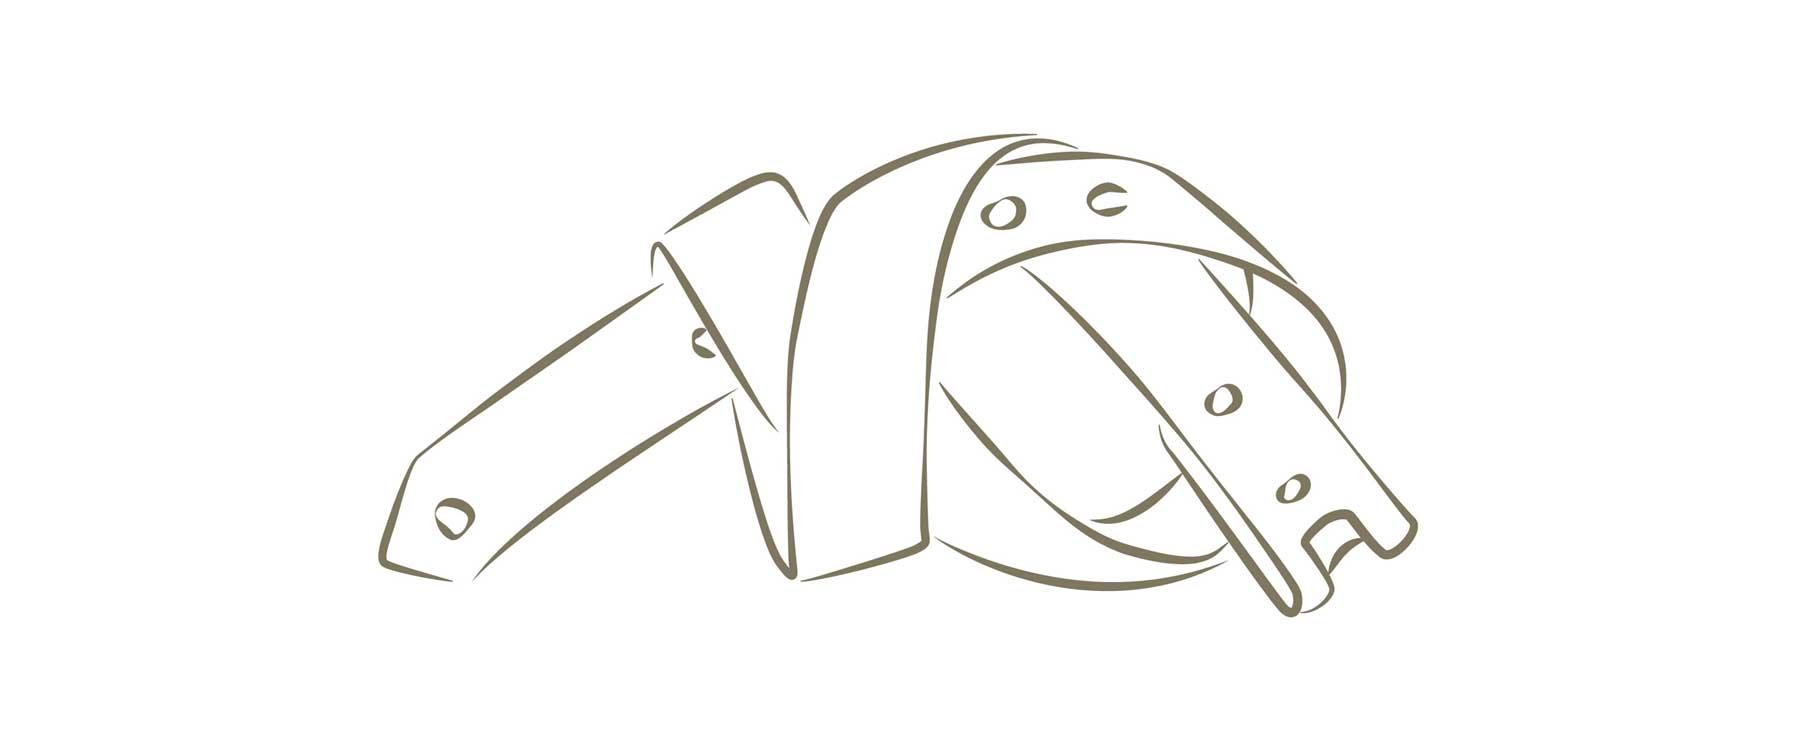 Strap-Sketch